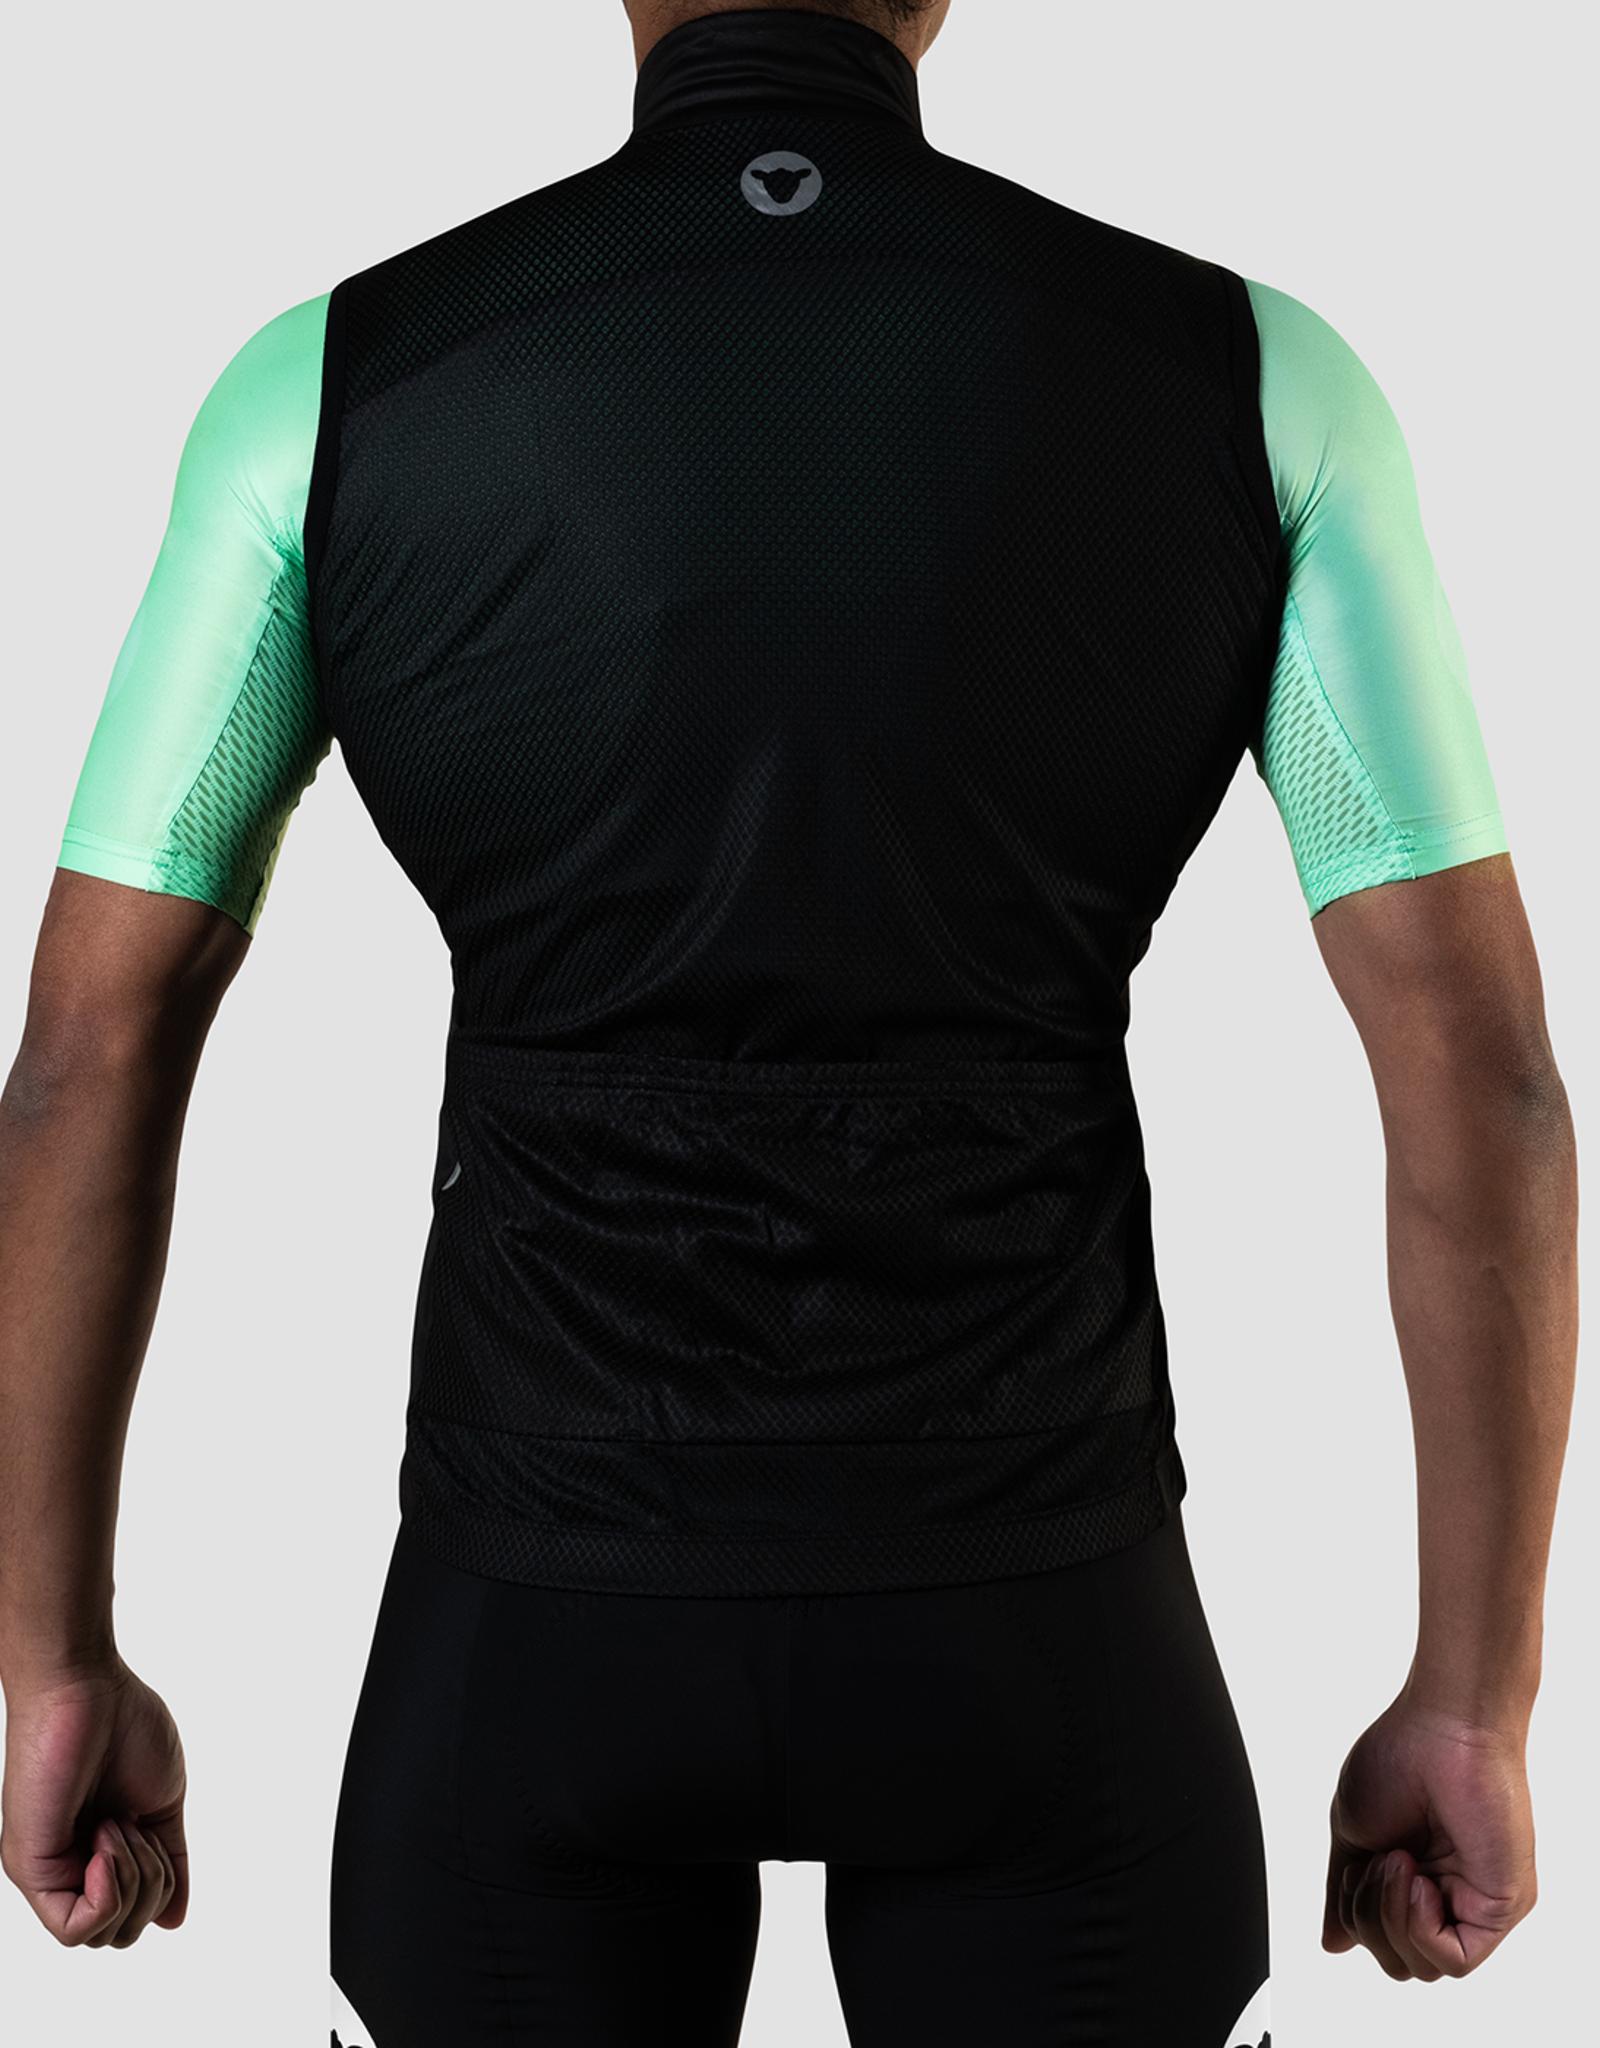 Black Sheep Cycling Men's TEAM Vest - Block Black